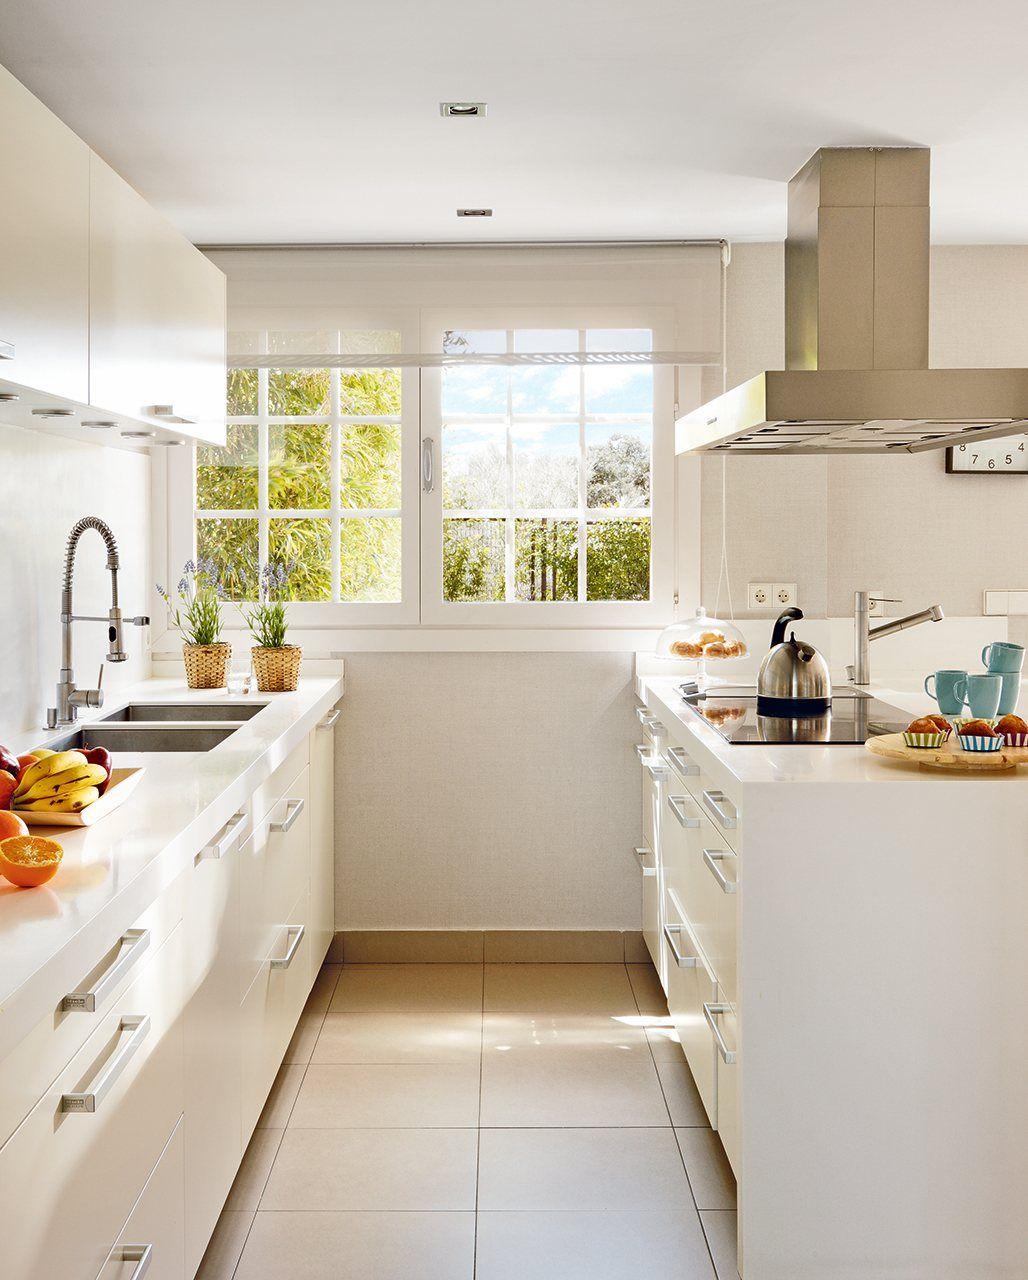 Reforma tu cocina: mínima obra, máximo ahorro · ElMueble.com ...